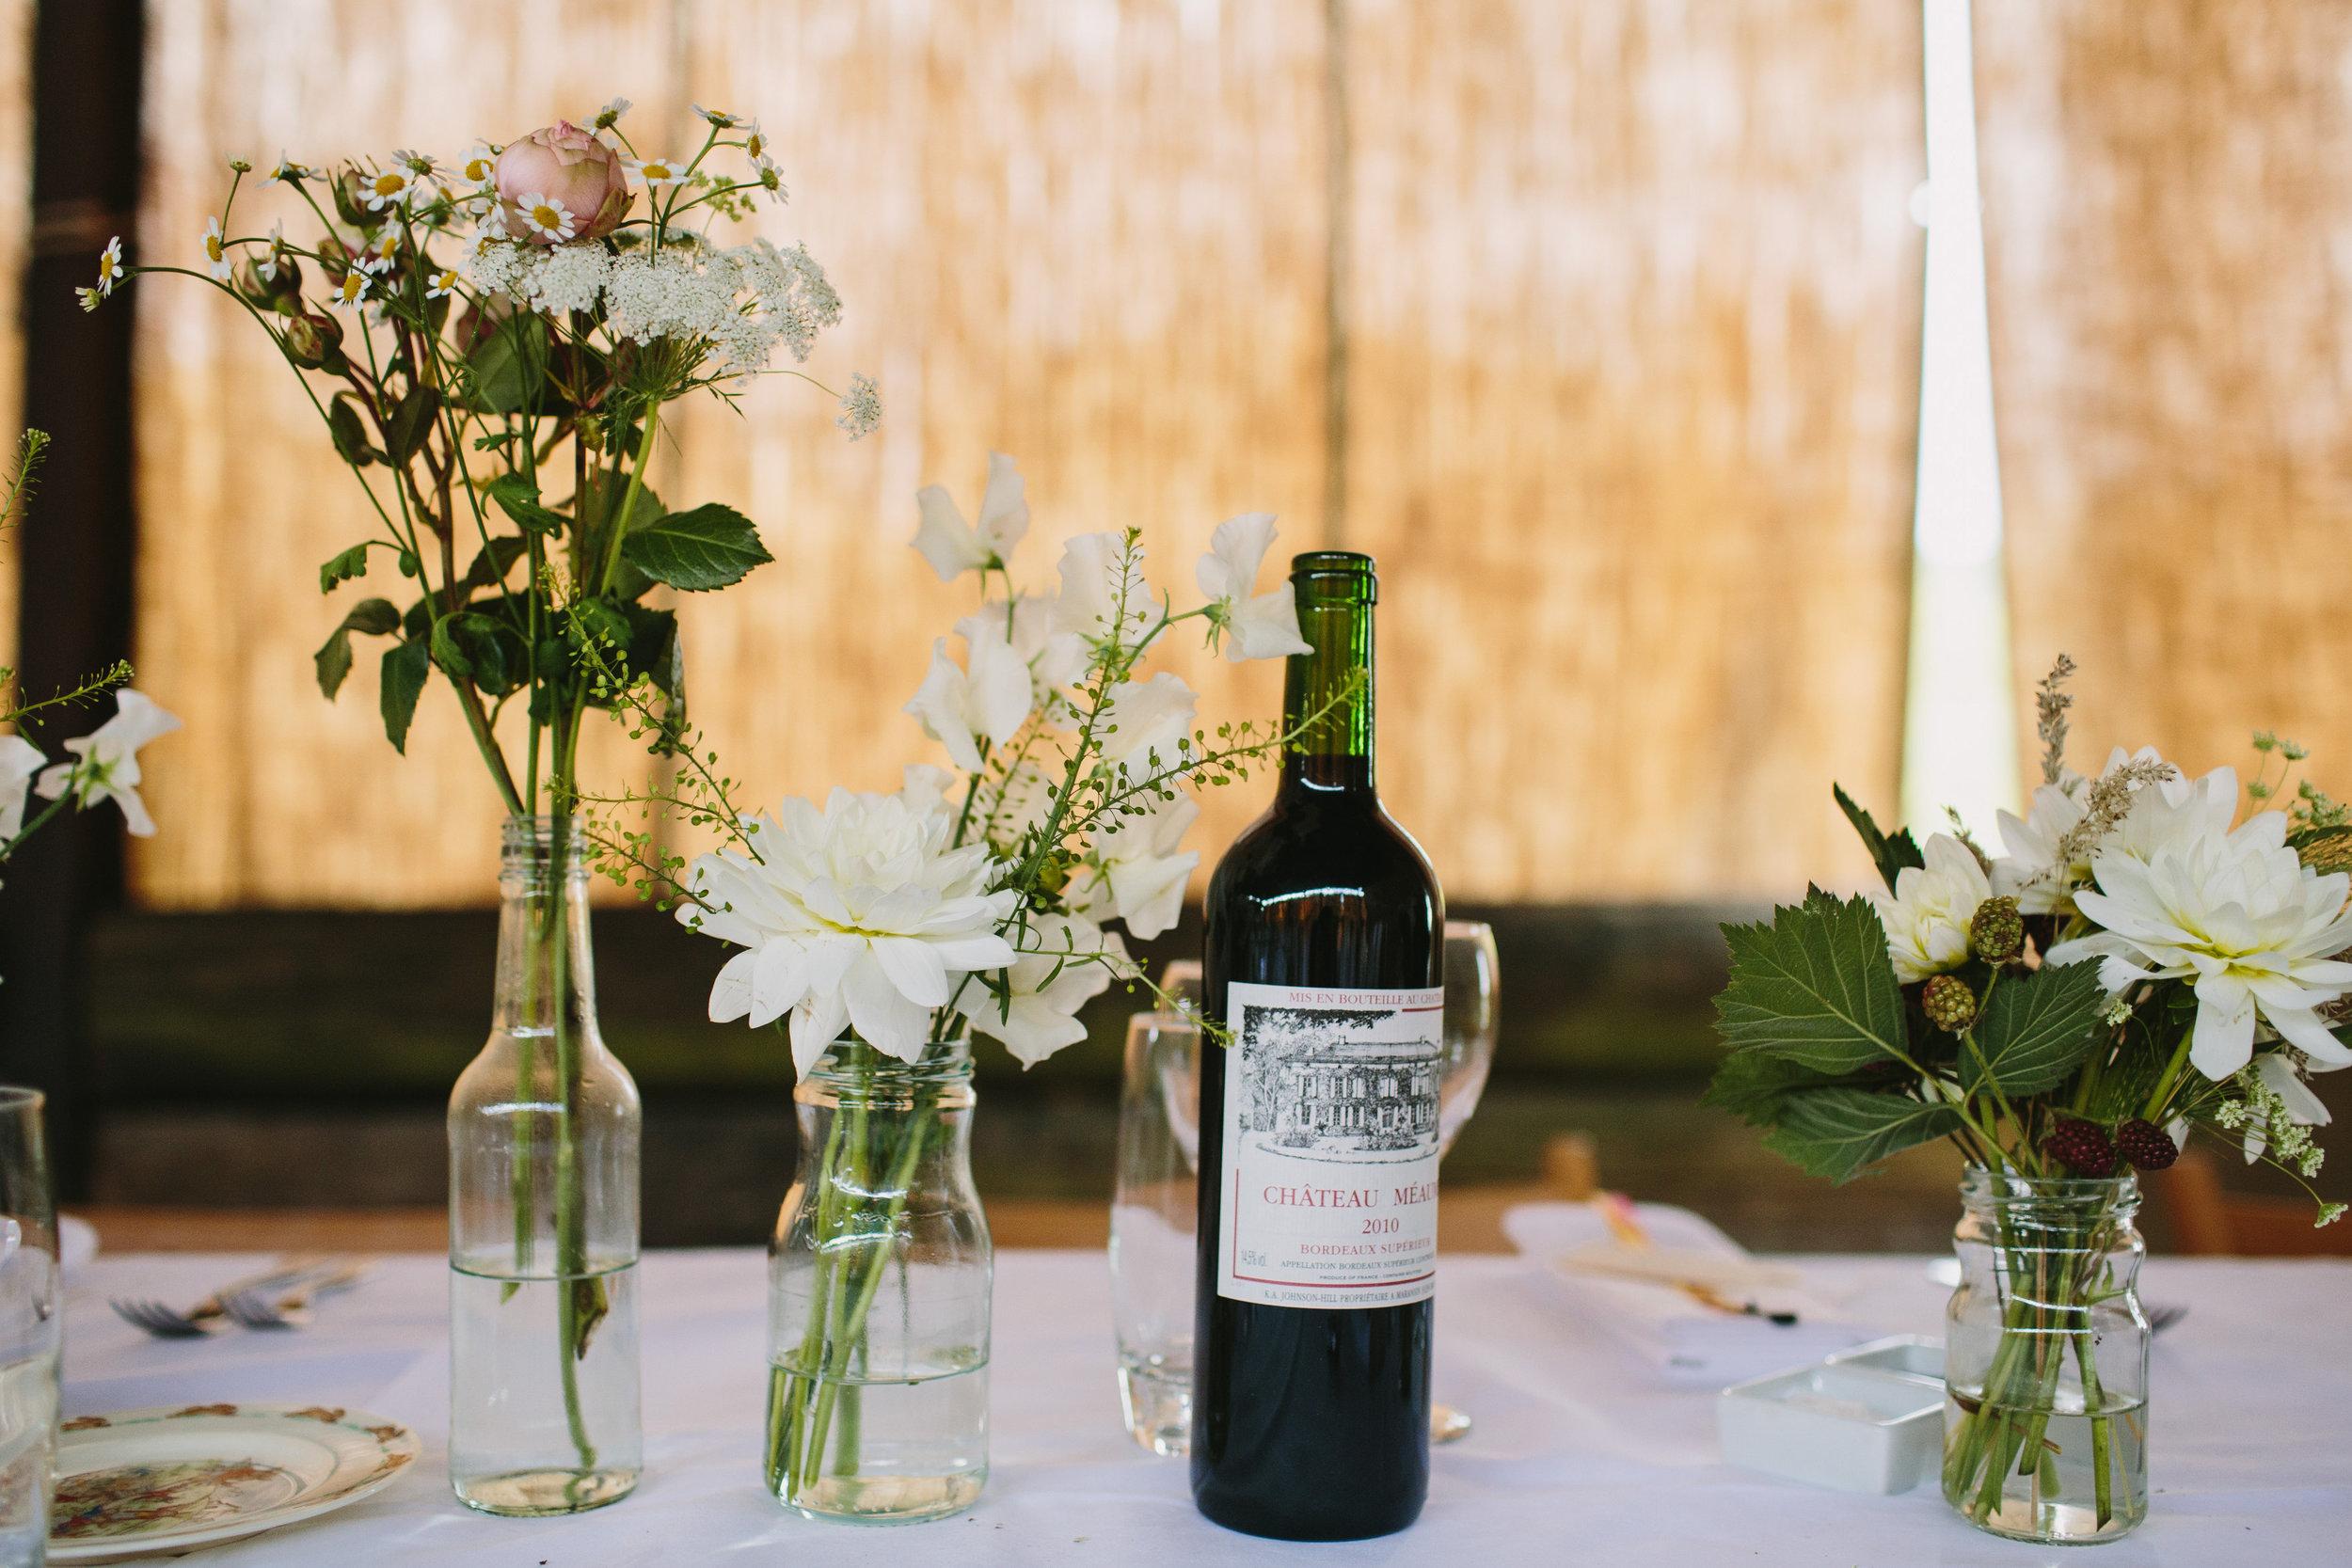 flowers-and-wine.jpg